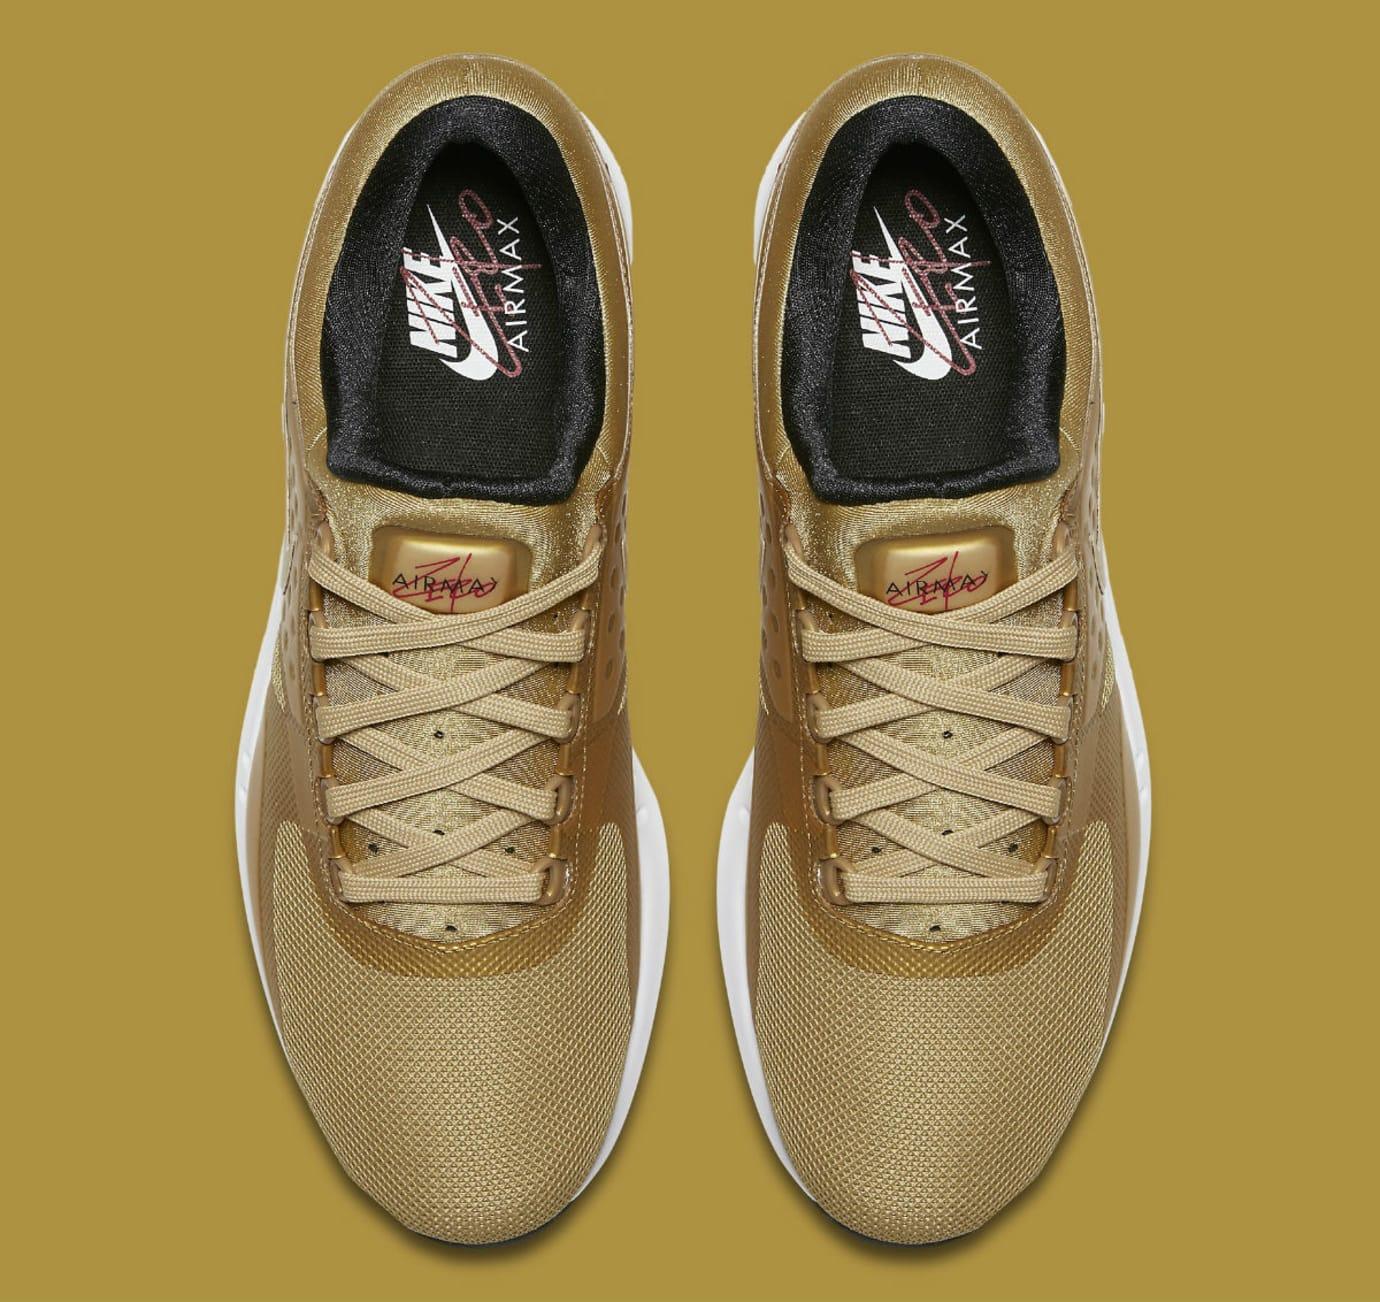 Date Nike Release 700Sole Air Metallic Gold Zero 789695 Max Collector sdthrCQx